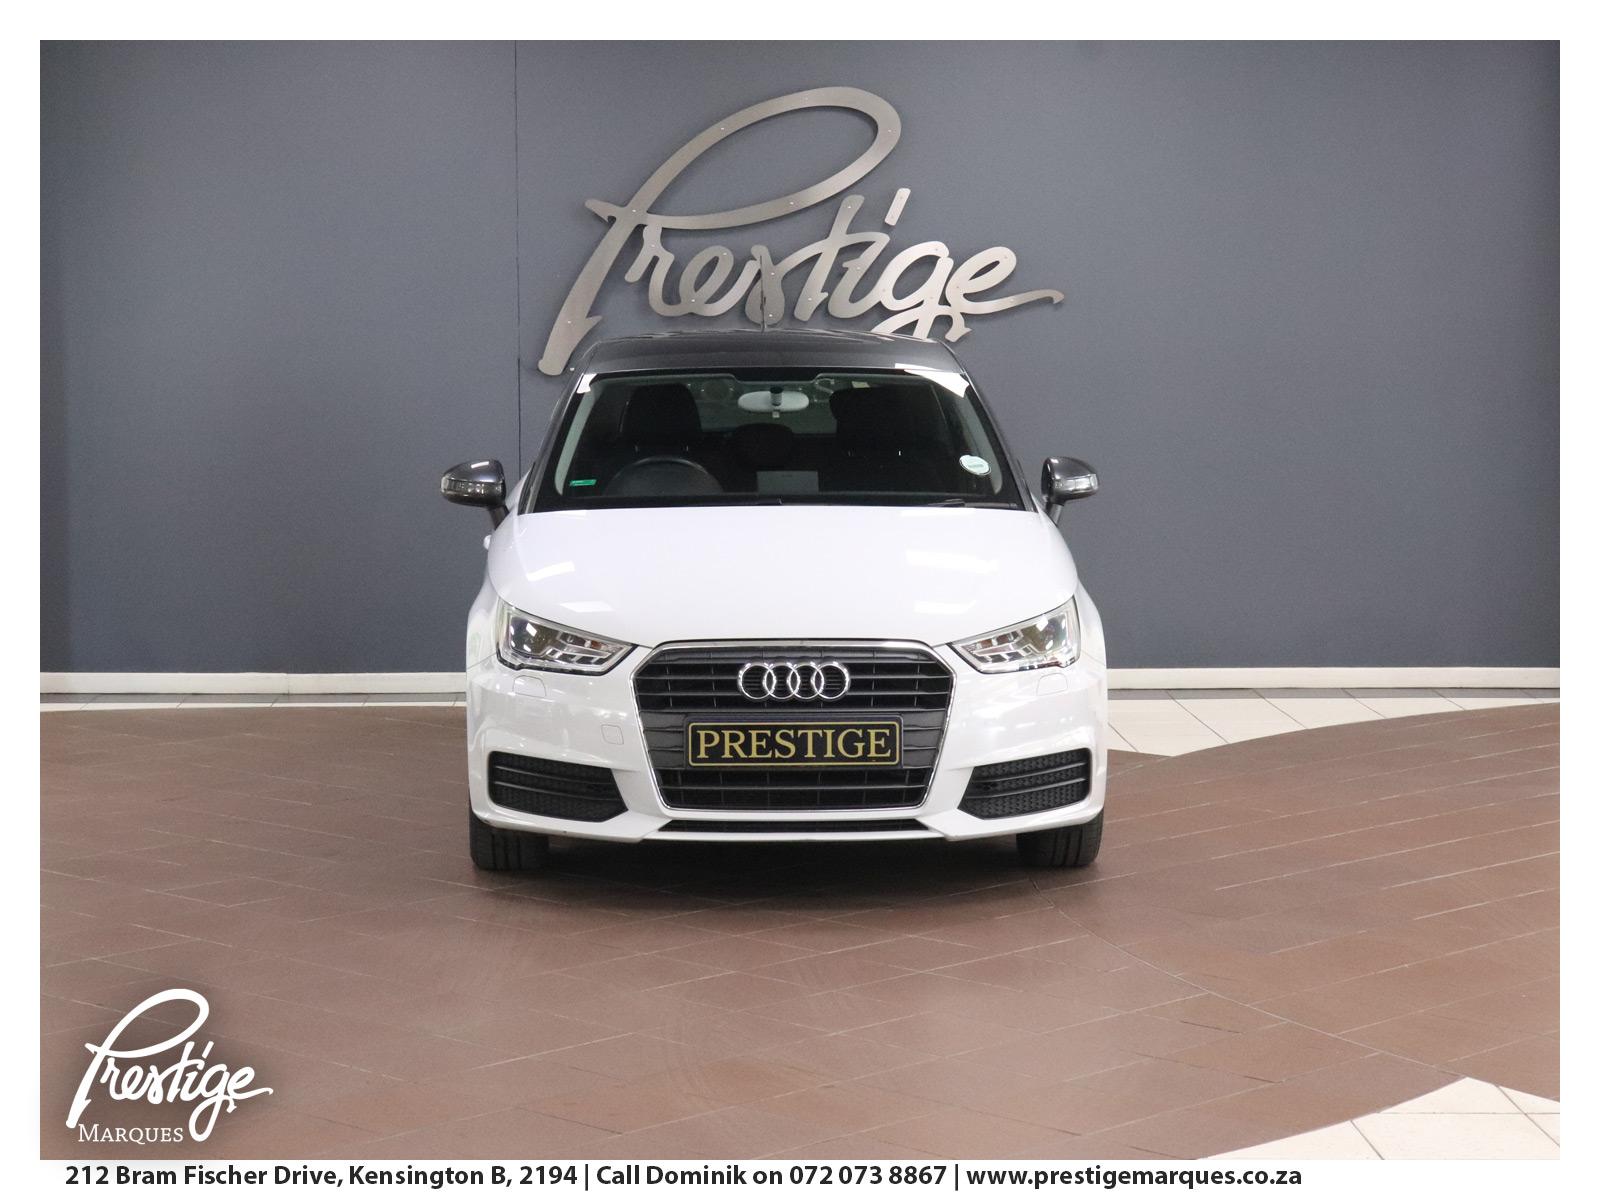 2015-Audi-A1-Prestige-Marques-Randburg-Sandton-7